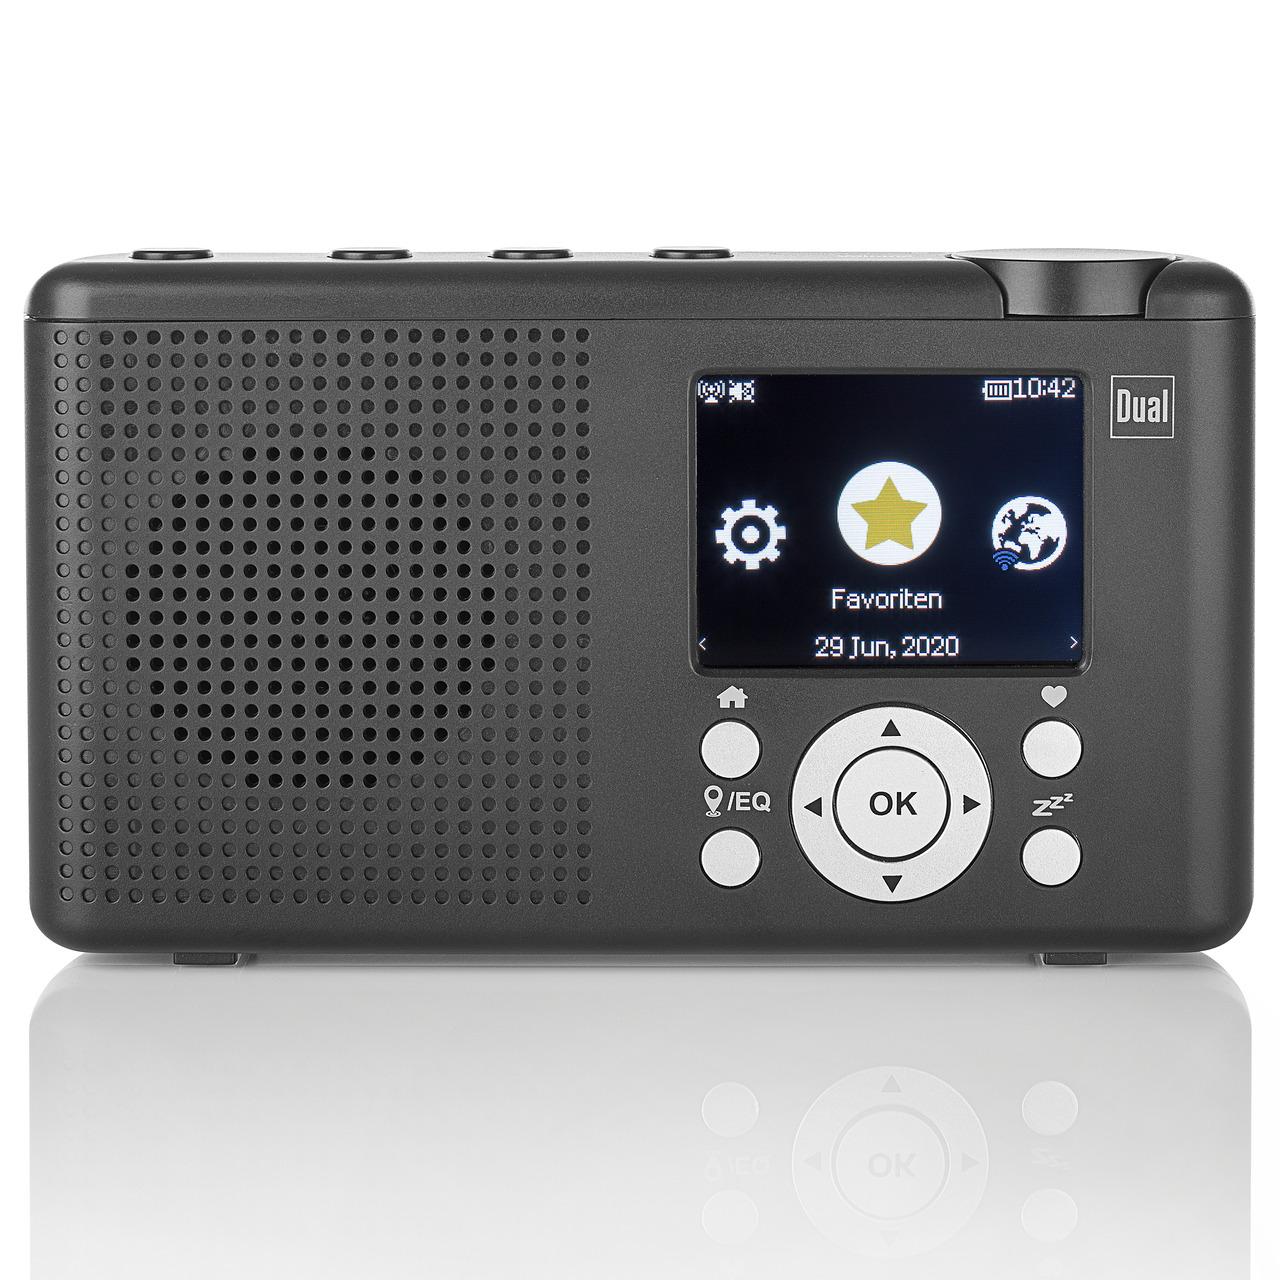 Dual Portables Hybrid-Digitalradio MCR 200- DAB+-UKW-Internetradio- Bluetooth- integrierter Akku